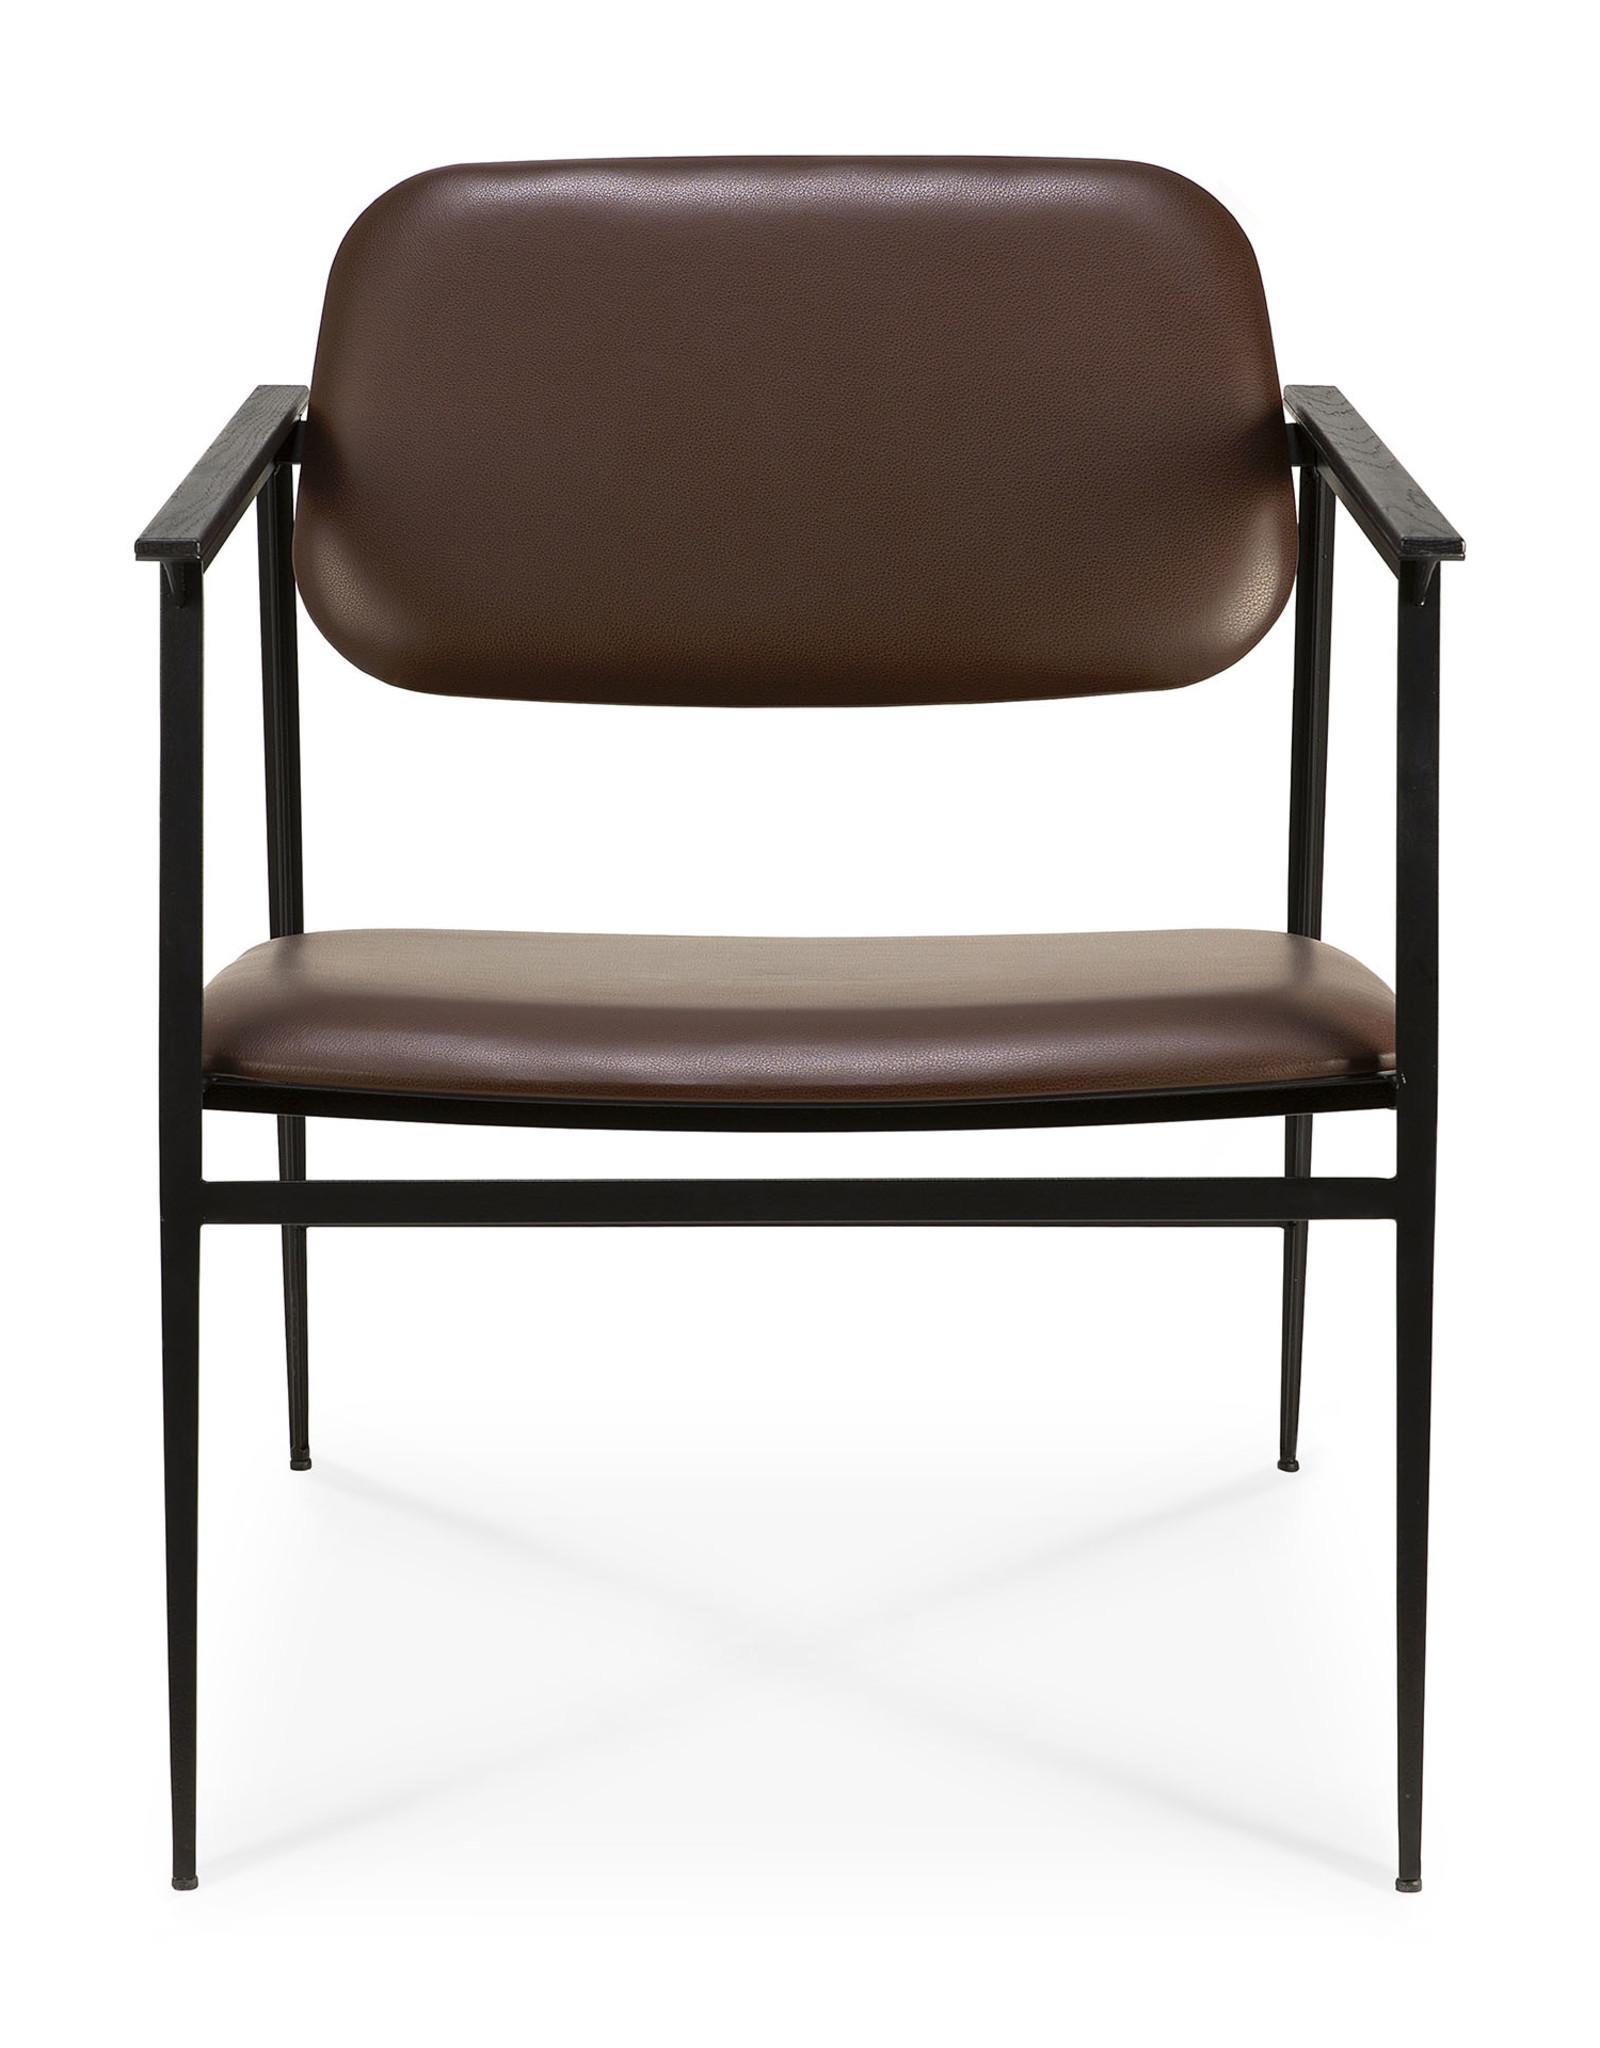 DC lounge chair - chocolate leather